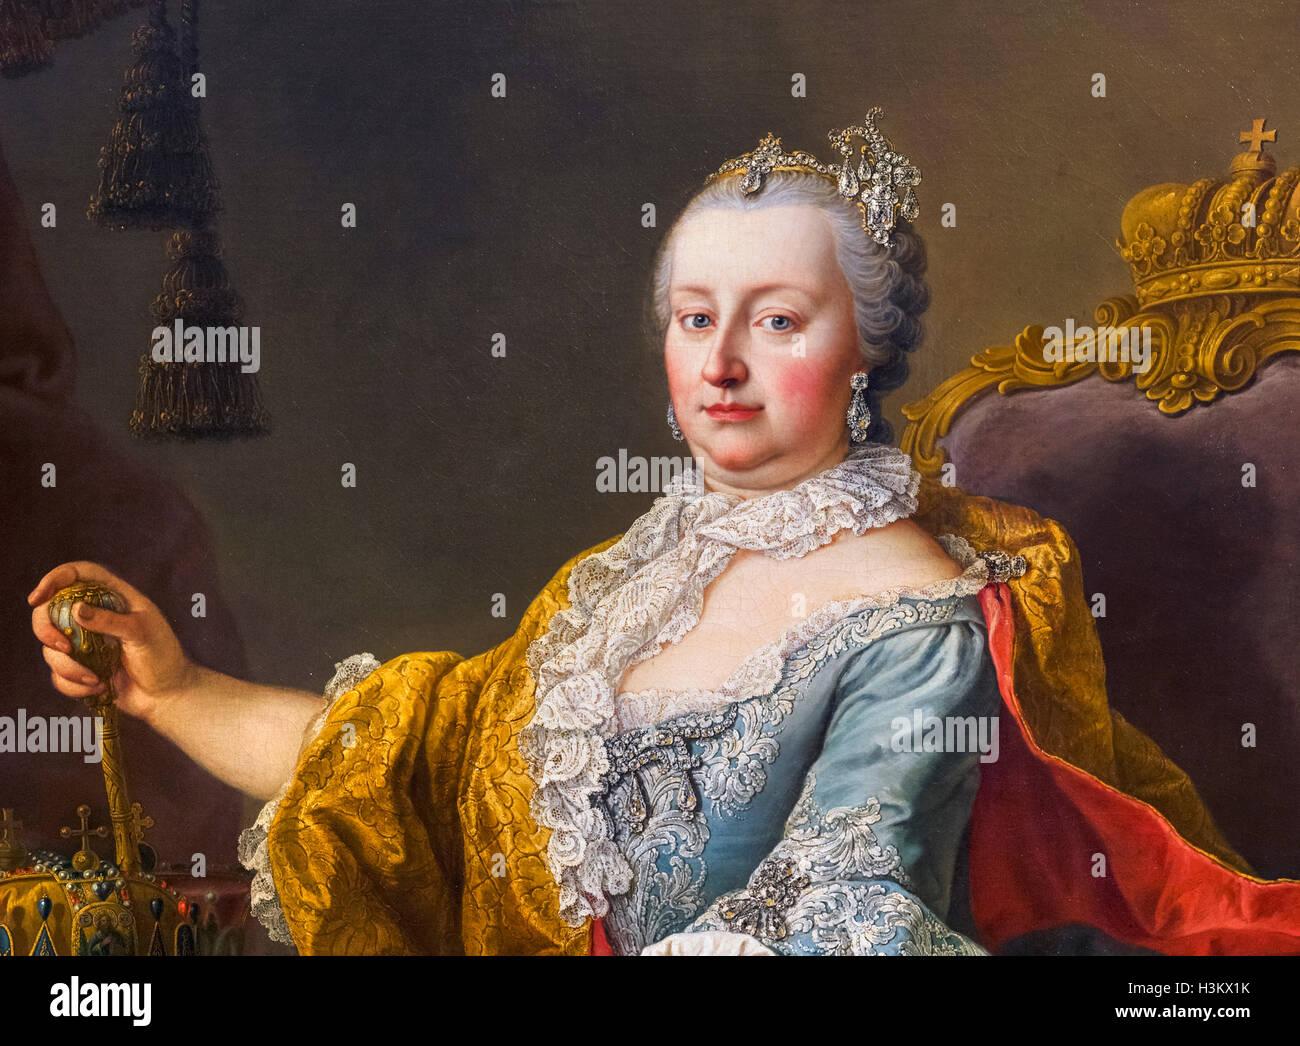 The Empress Maria Theresa (Maria Theresa Walburga Amalia Christina - 1717-1780) by Martin van Meytens, oil on canvas, - Stock Image